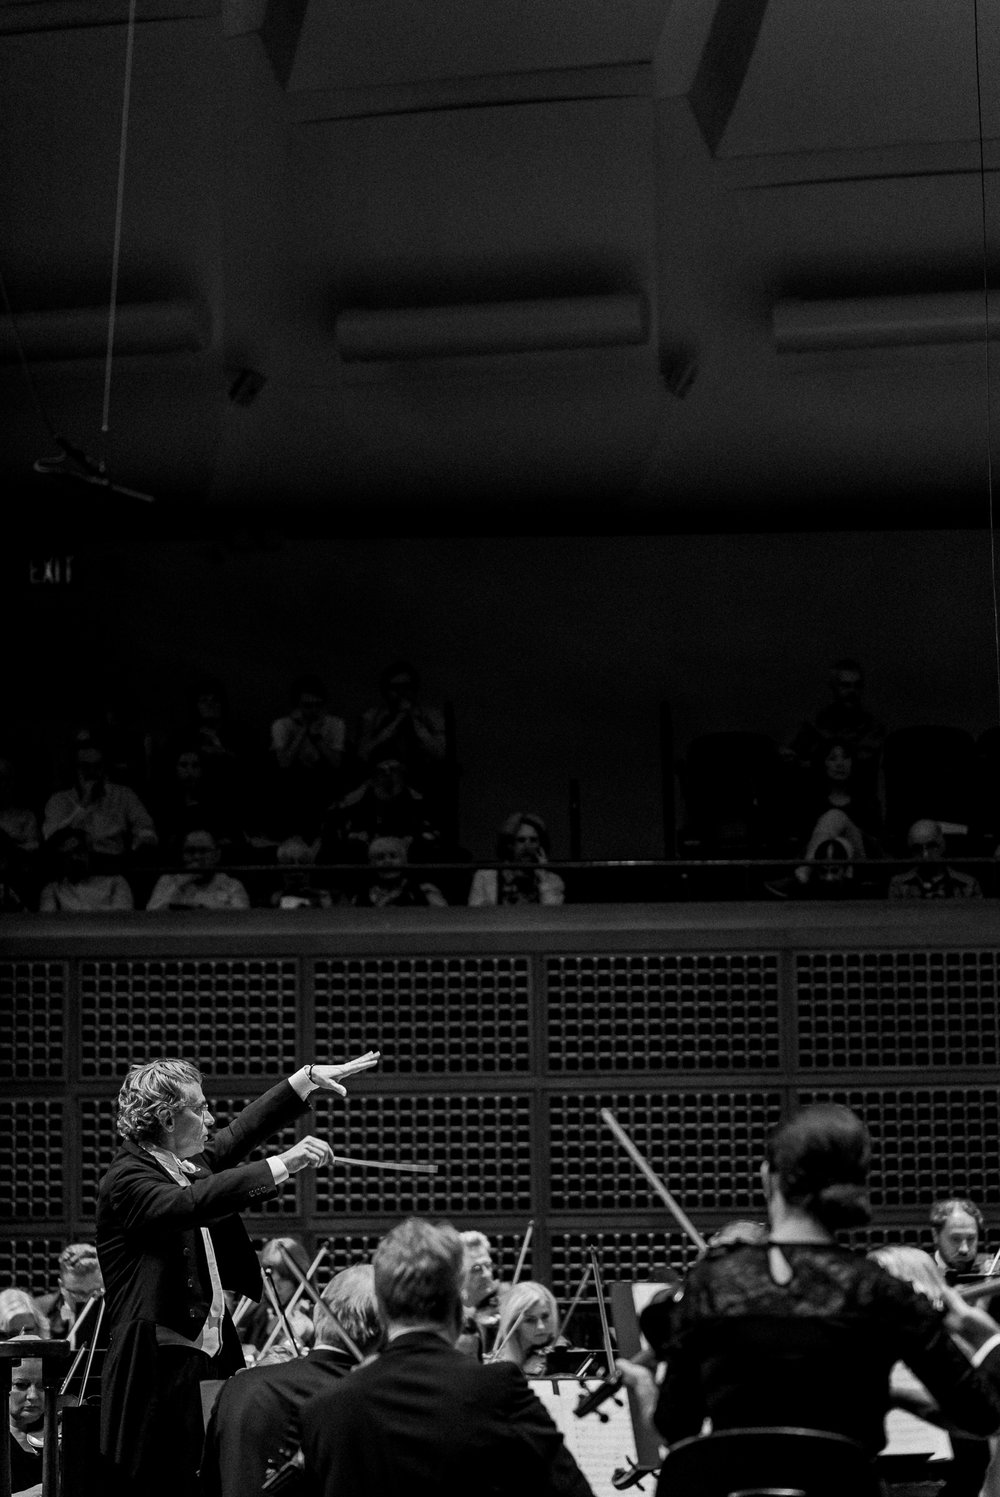 danish_national_symphony_orchestra_davies_hall_brandon_patoc_luisi_0011.jpg